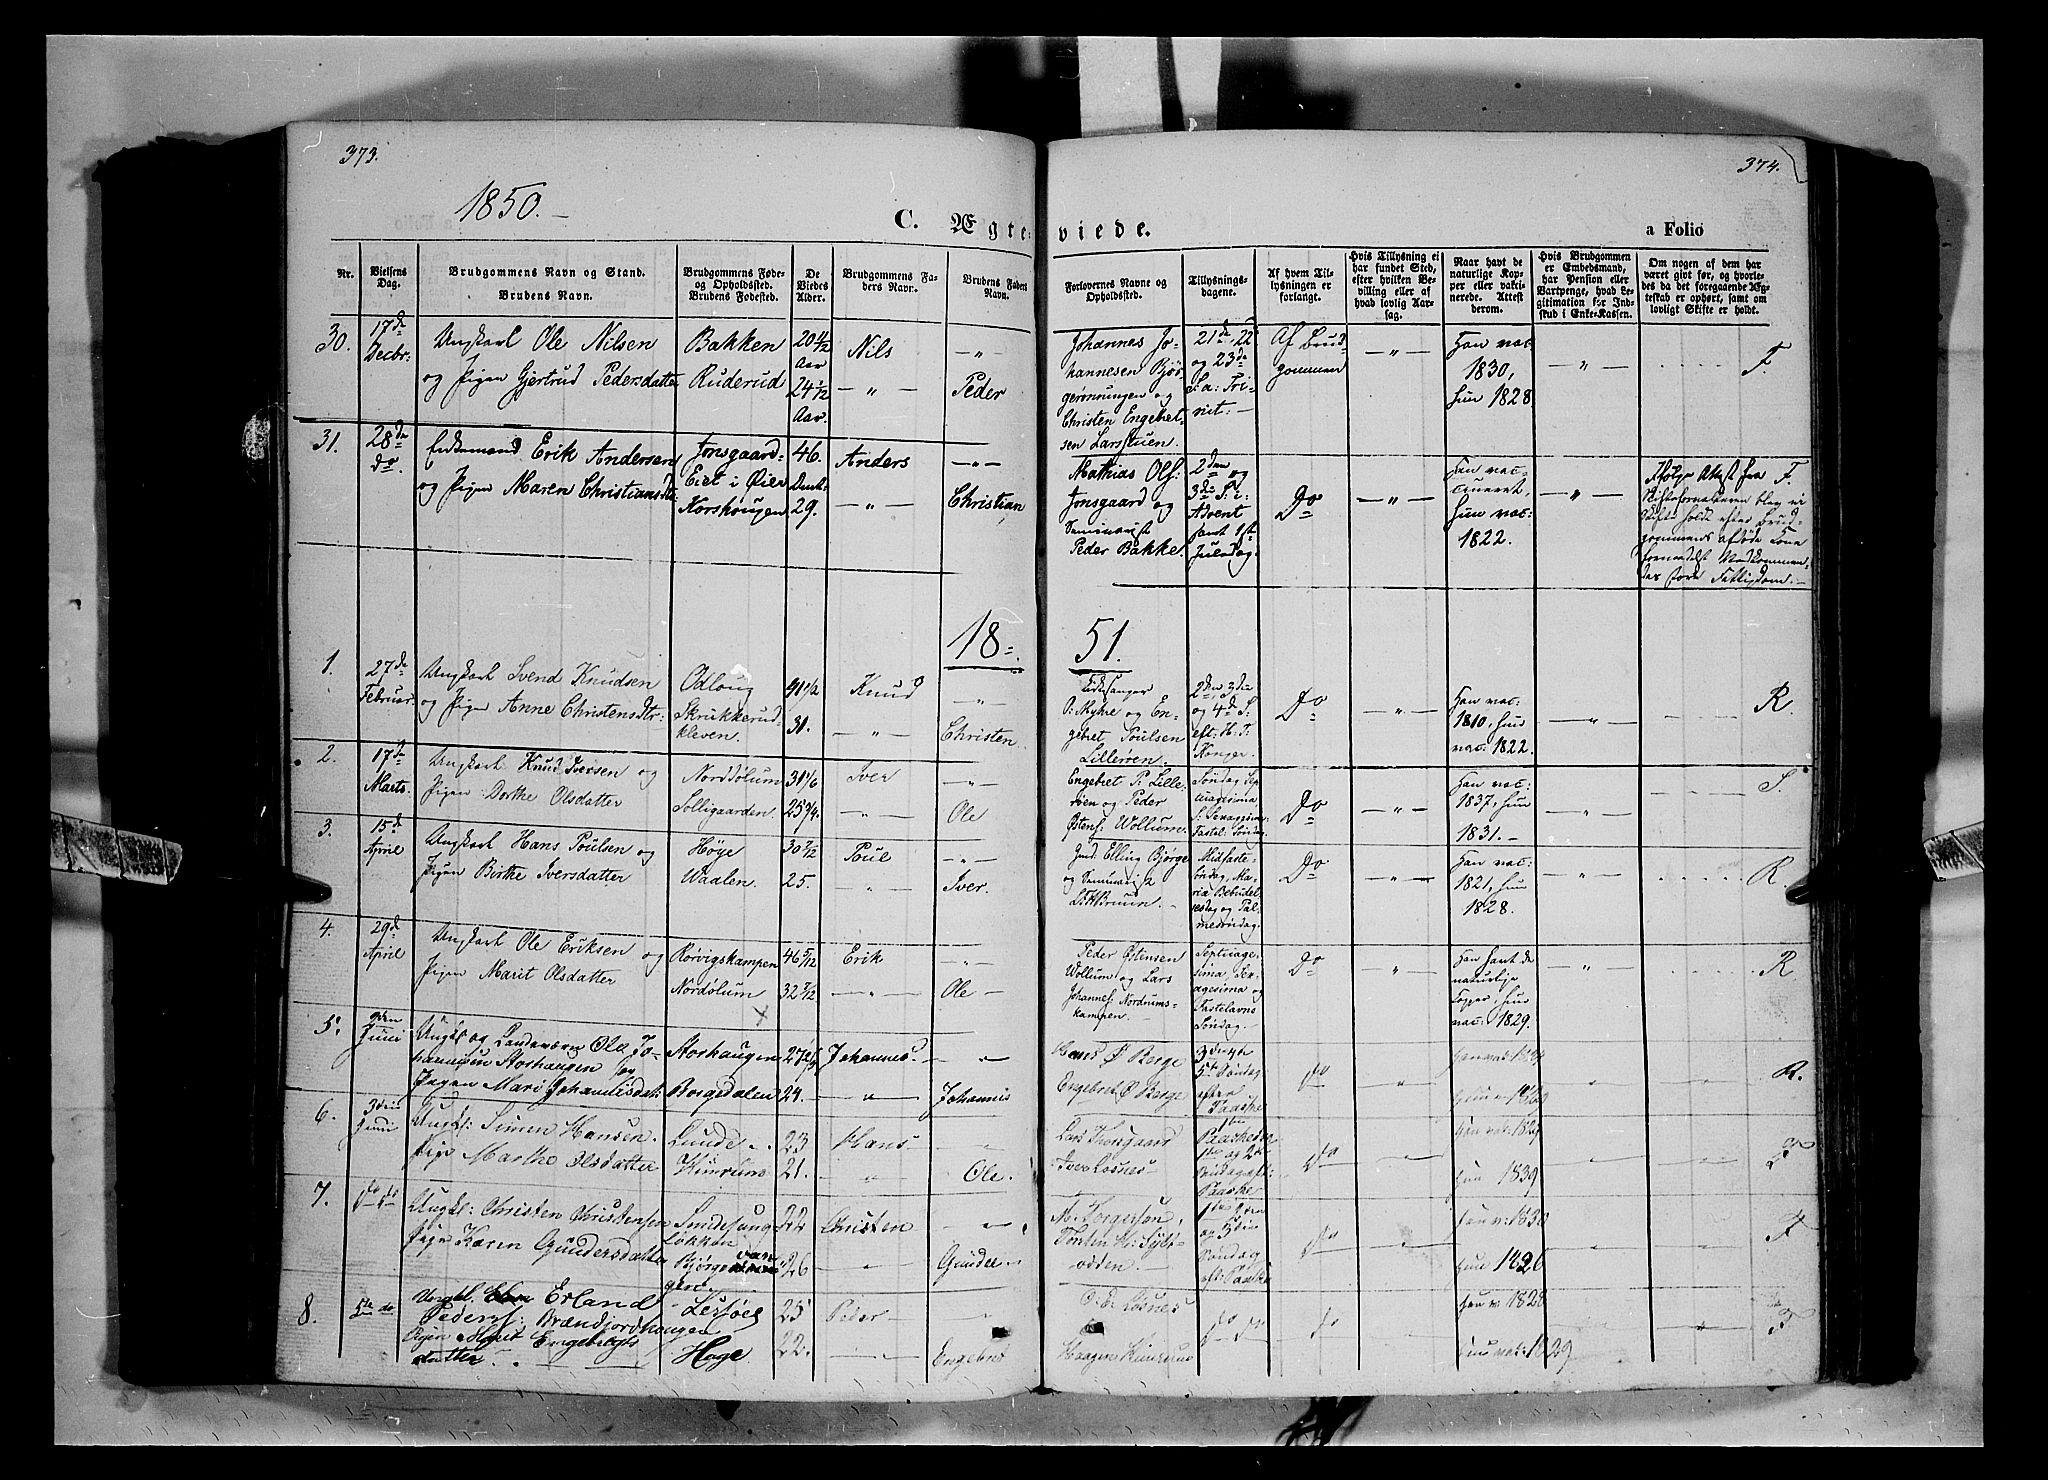 SAH, Ringebu prestekontor, Ministerialbok nr. 6, 1848-1859, s. 373-374